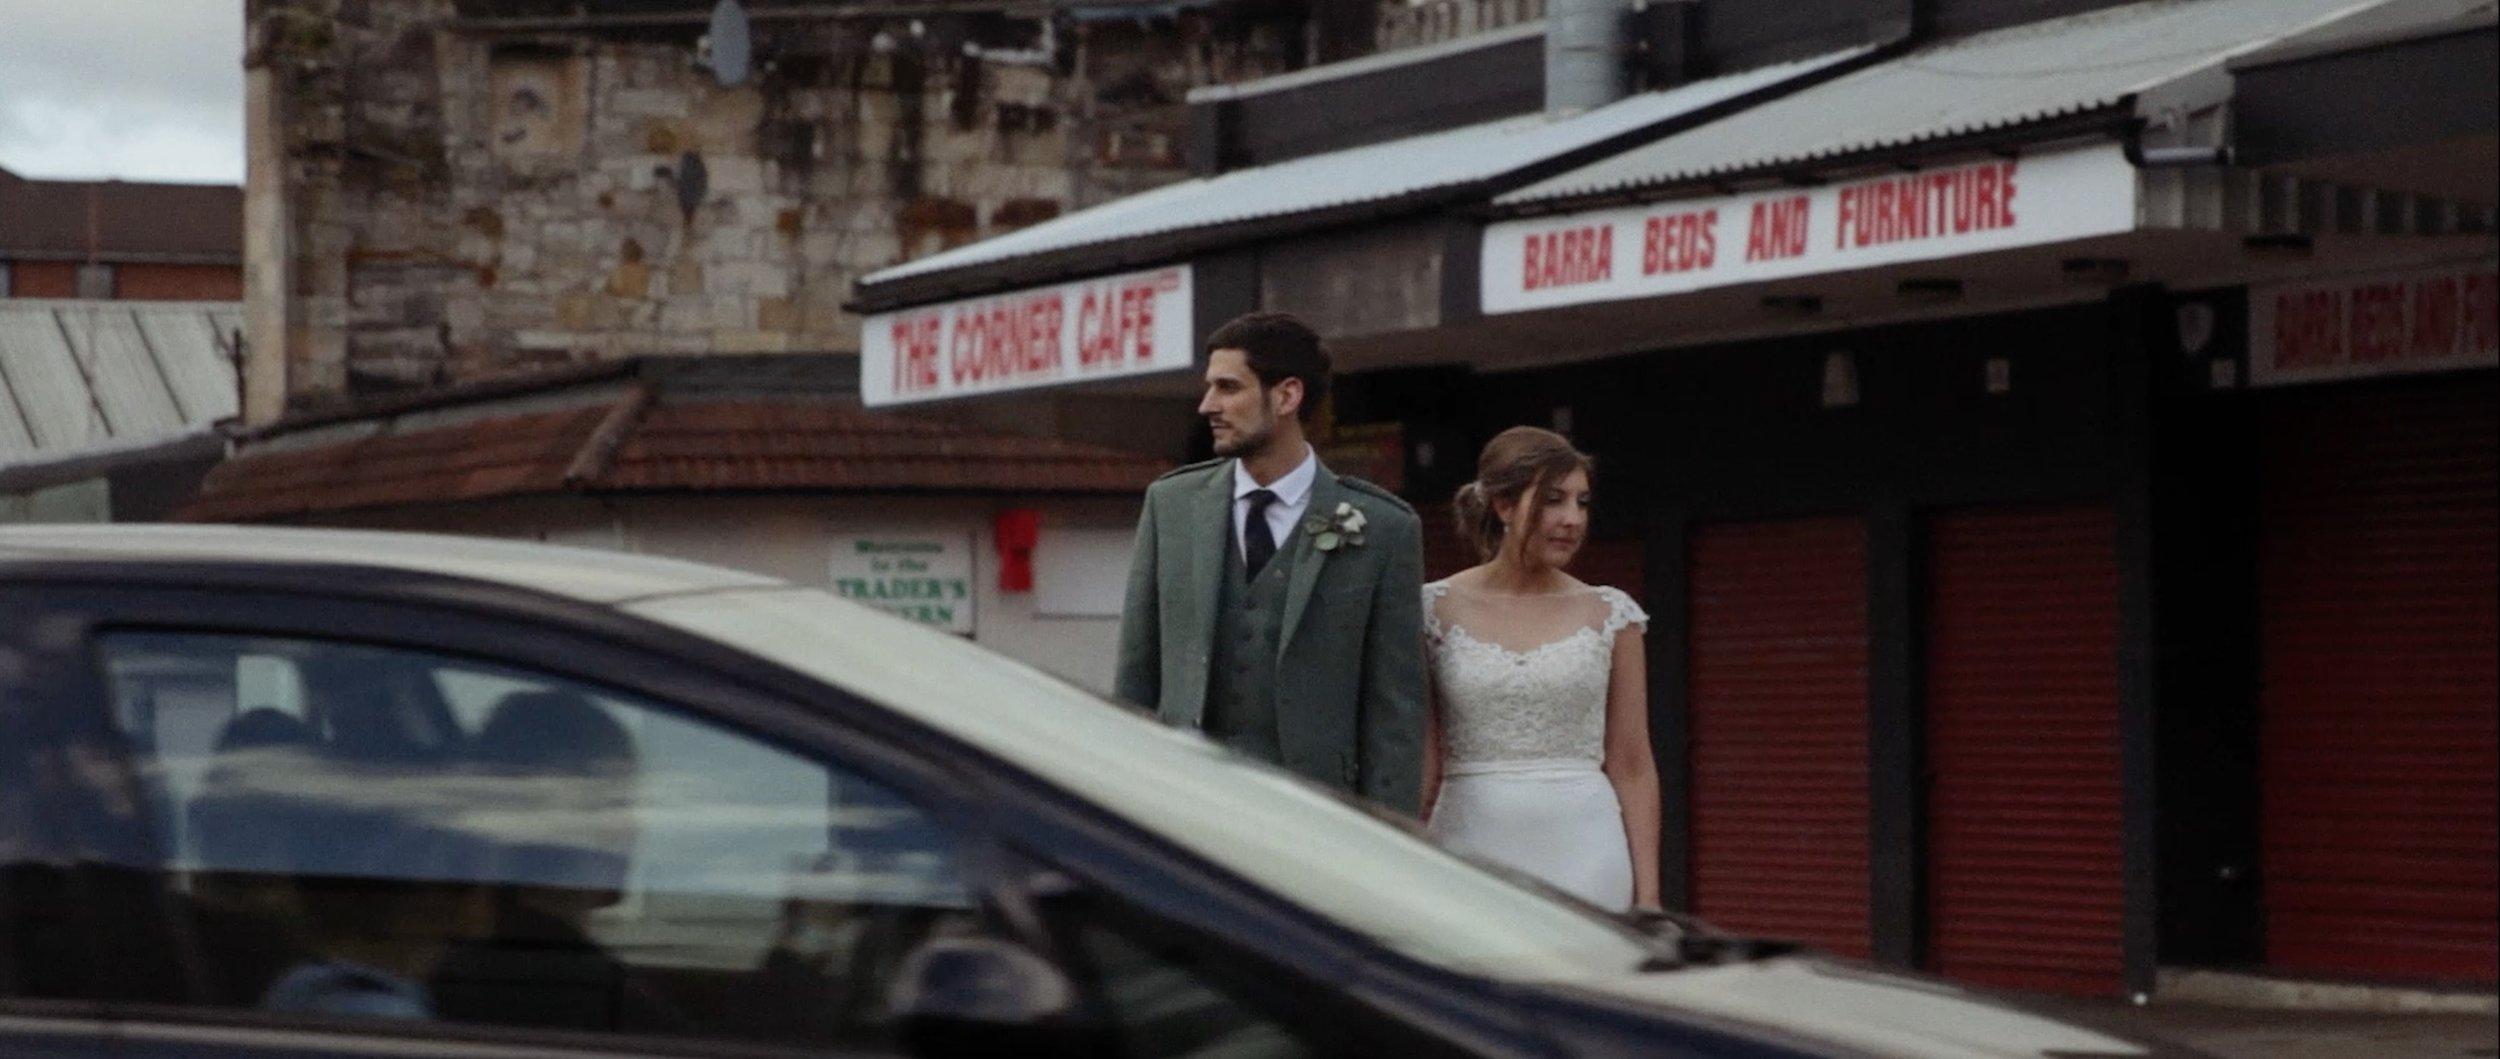 oran-mor-wedding-videographer_LL_05.jpg